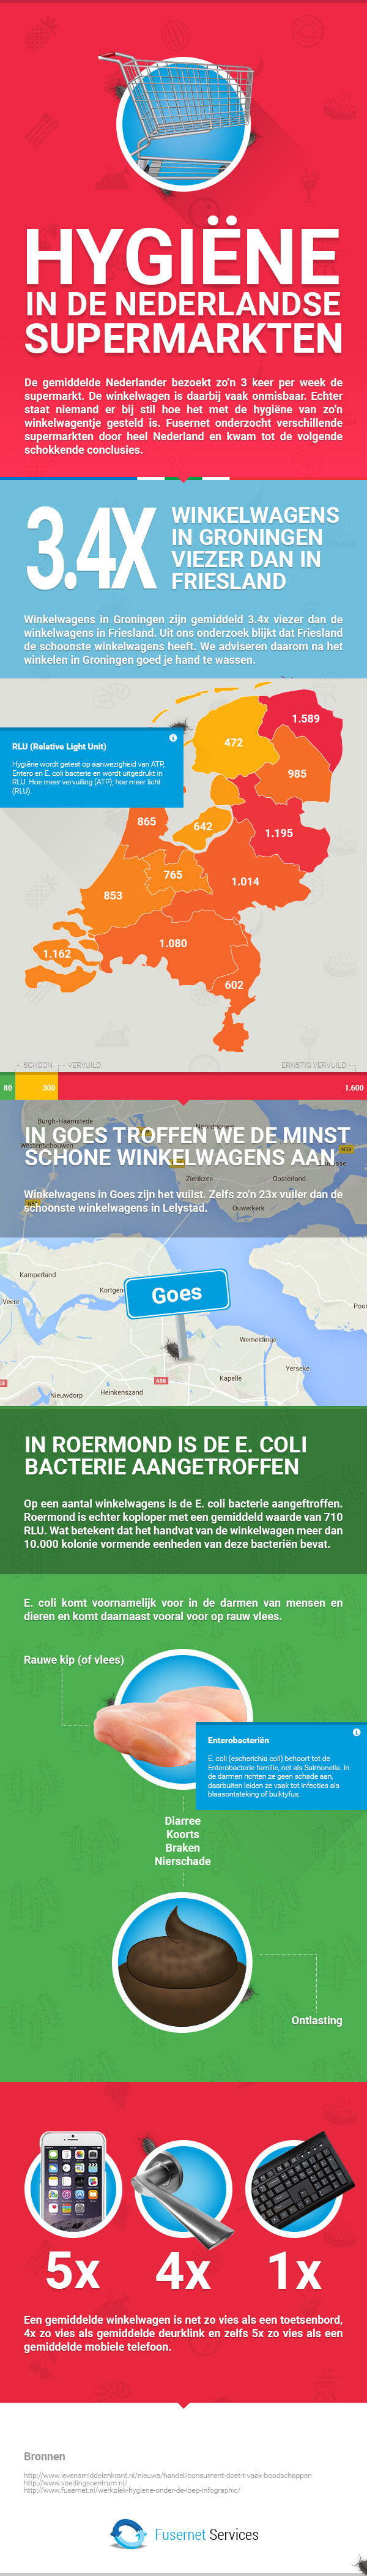 Fusernet---Infographic-Supermarkt-v1-4